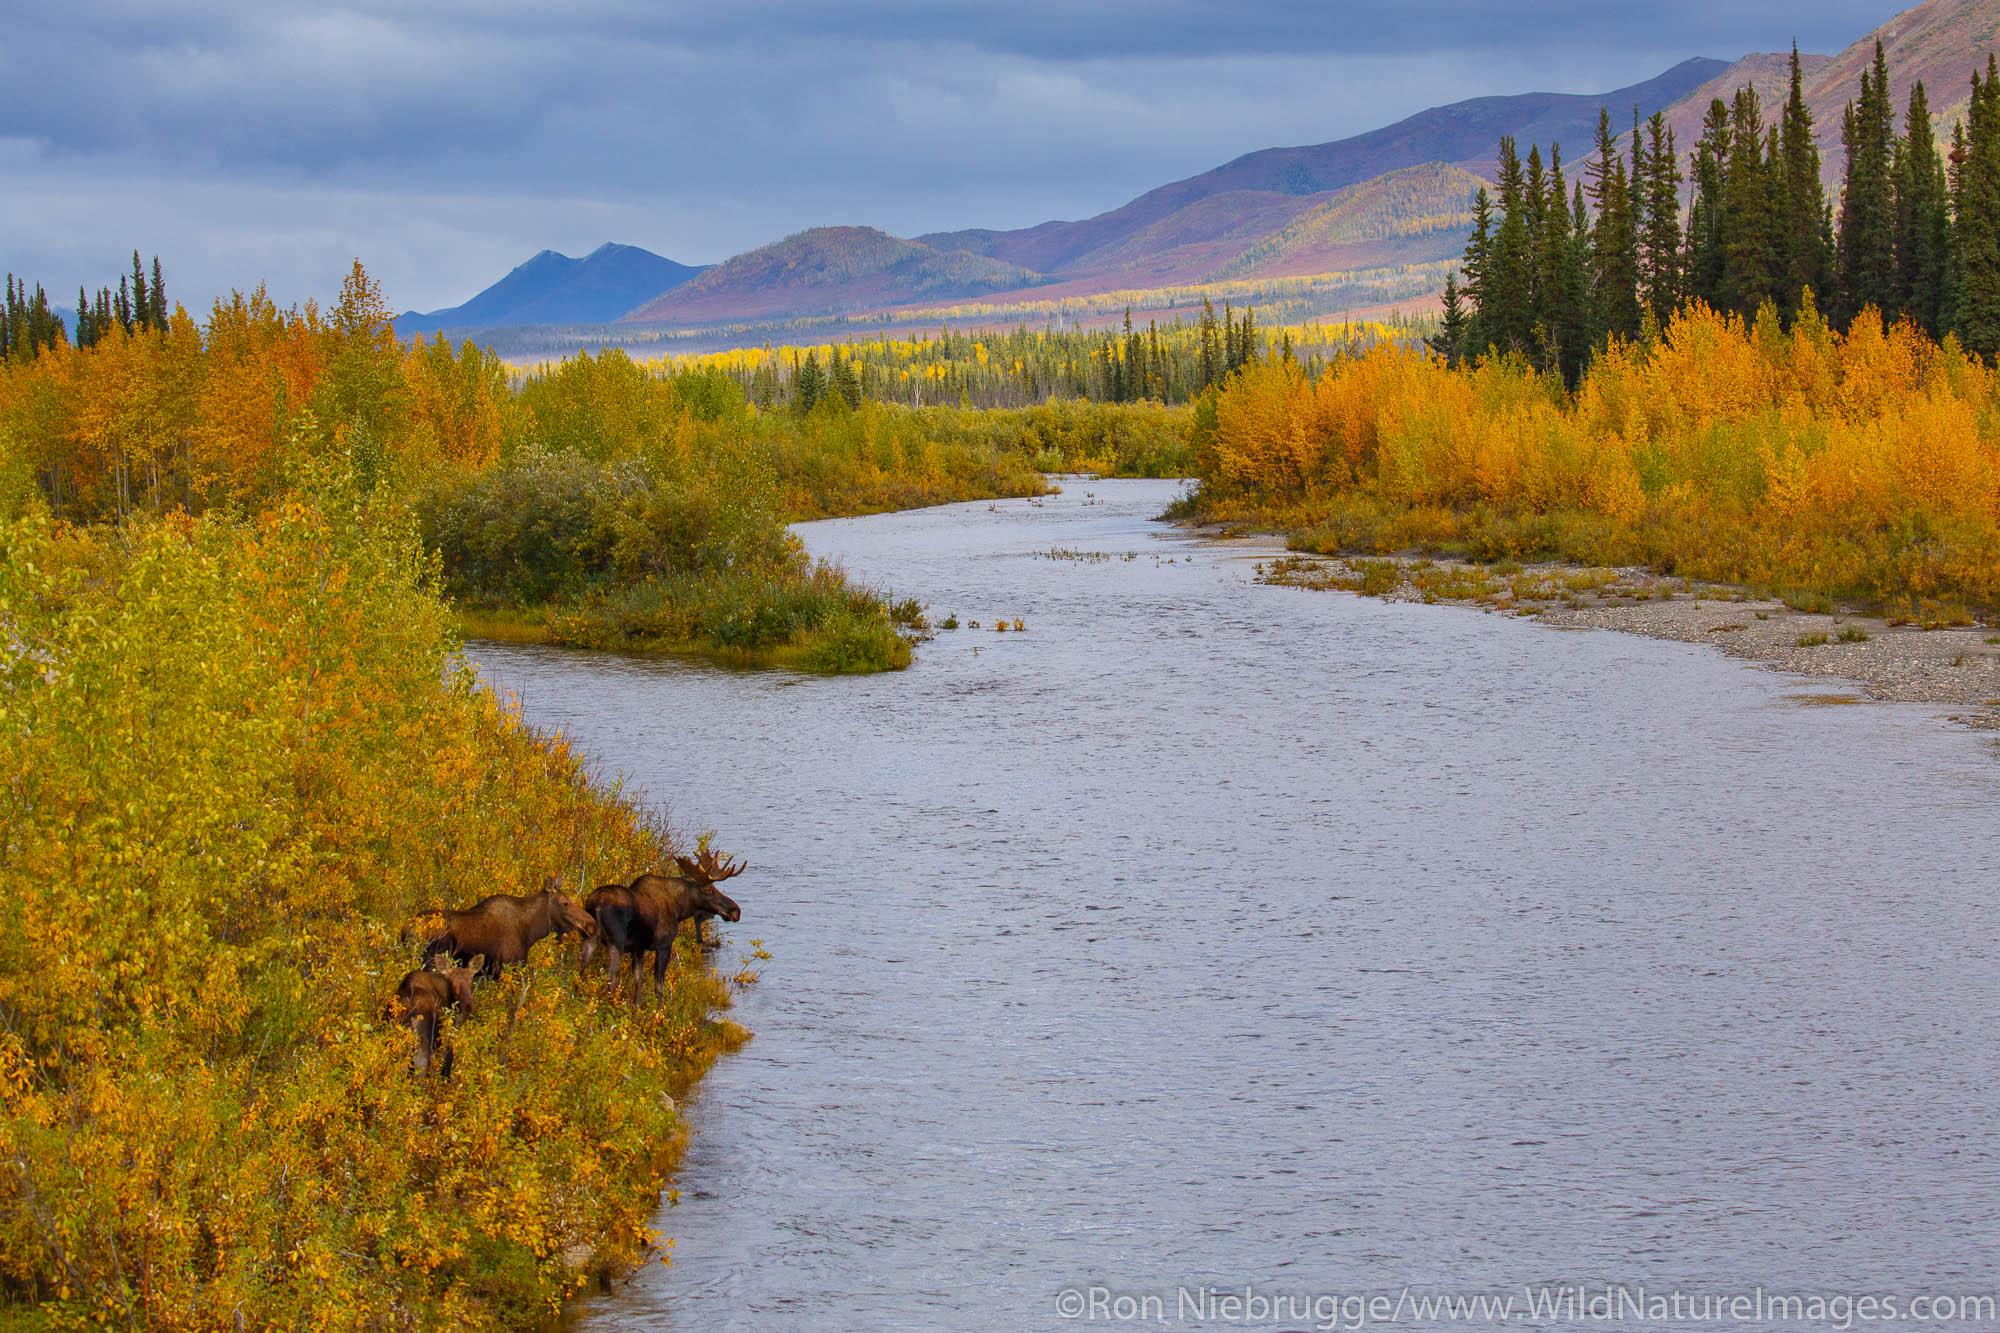 Moose in the autumn colors along the Dalton Highway, Alaska.